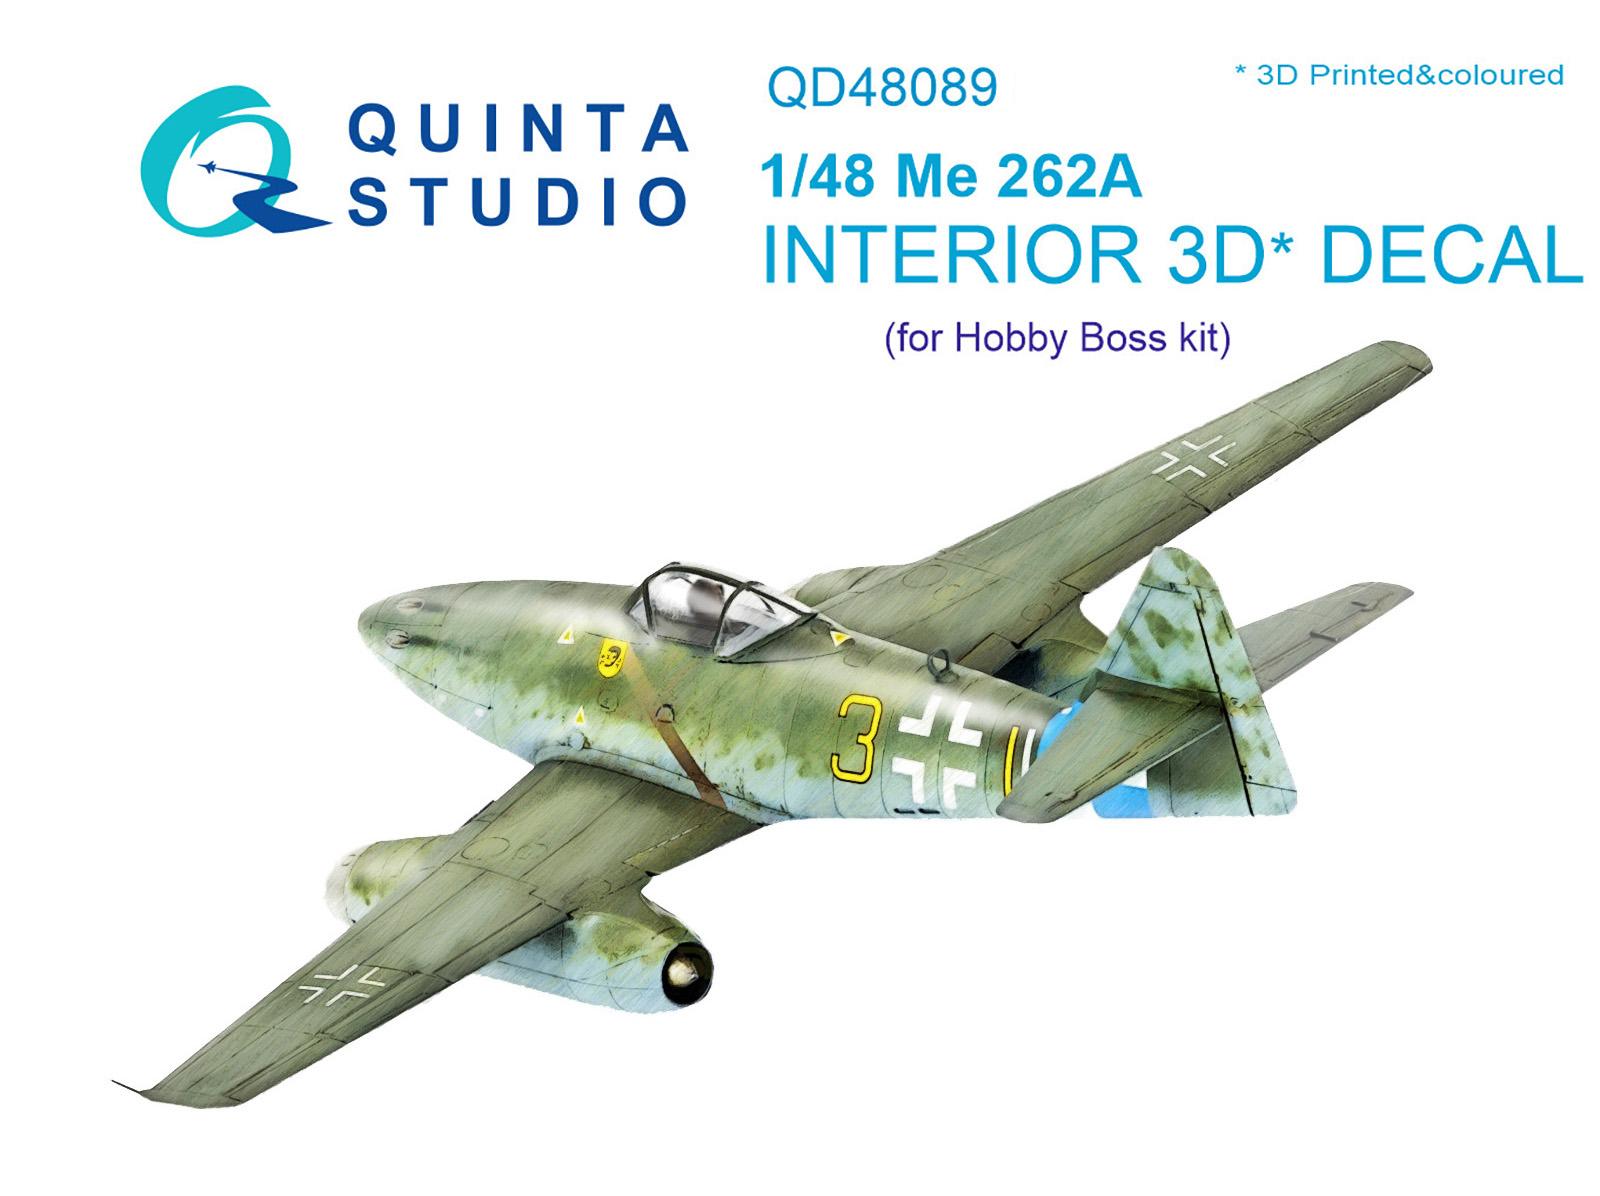 QD48089